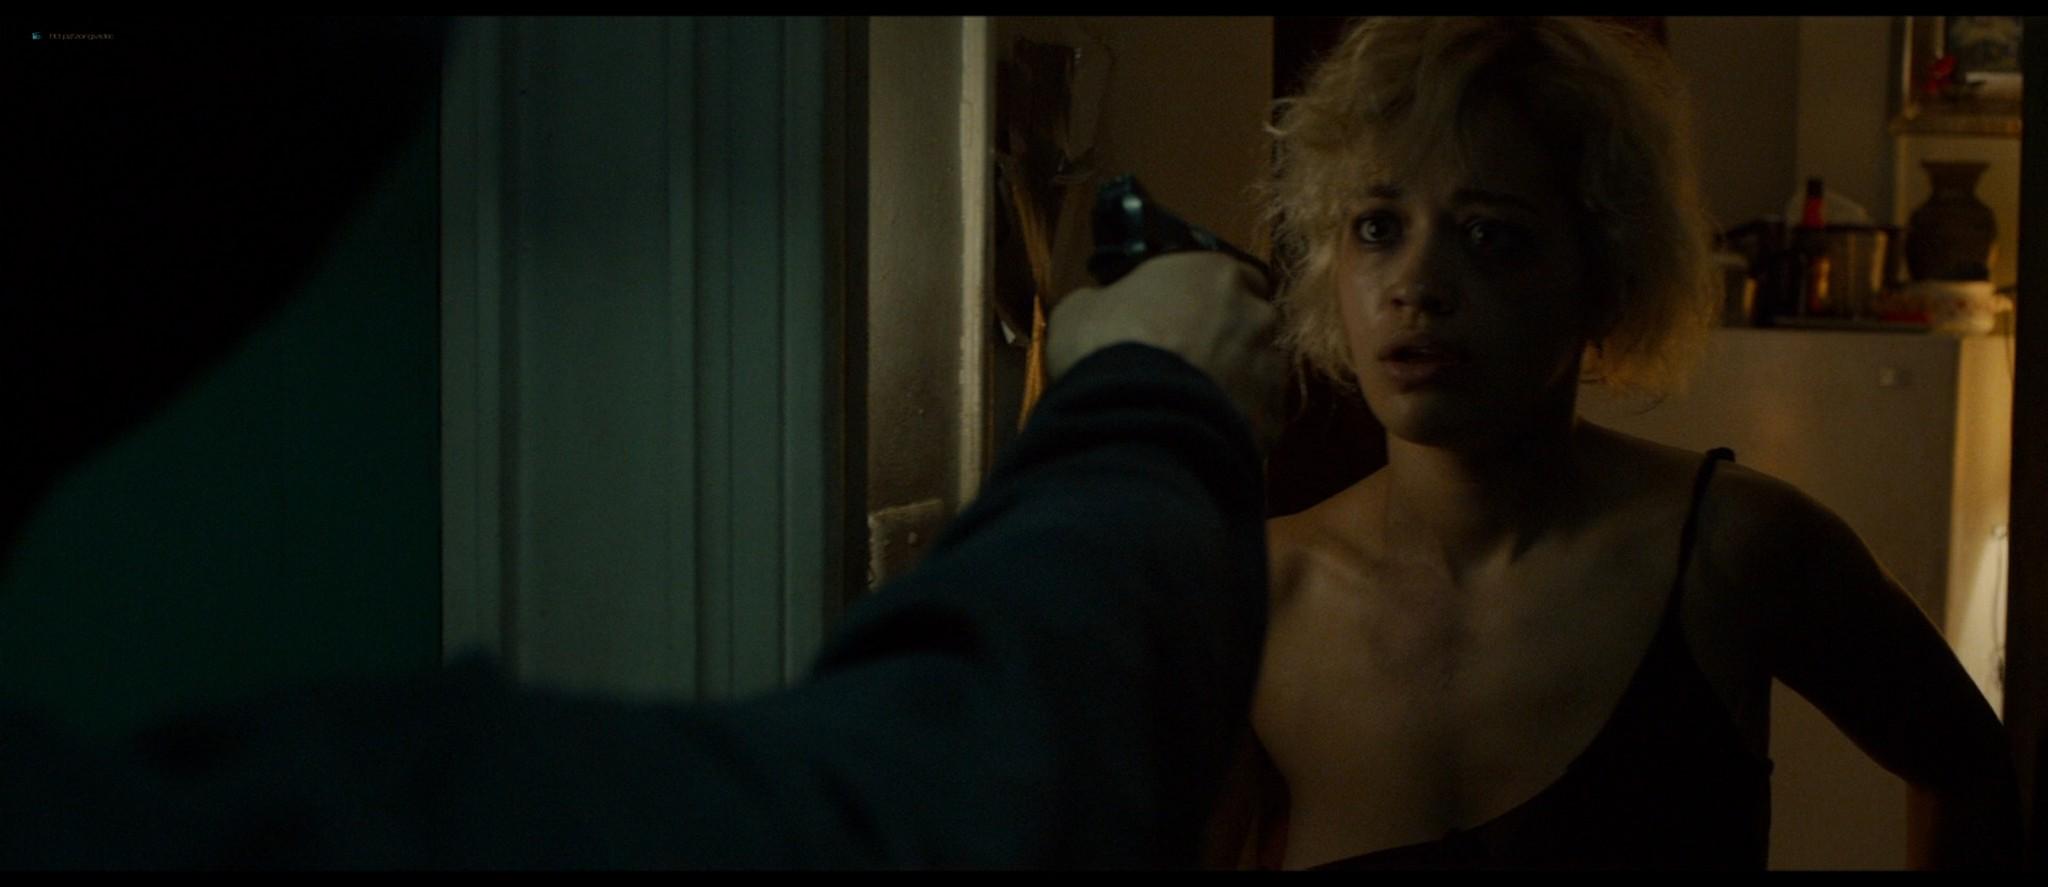 Rachel McAdams hot in panties and bra - Southpaw (2015) HD 1080p BluRay (2)